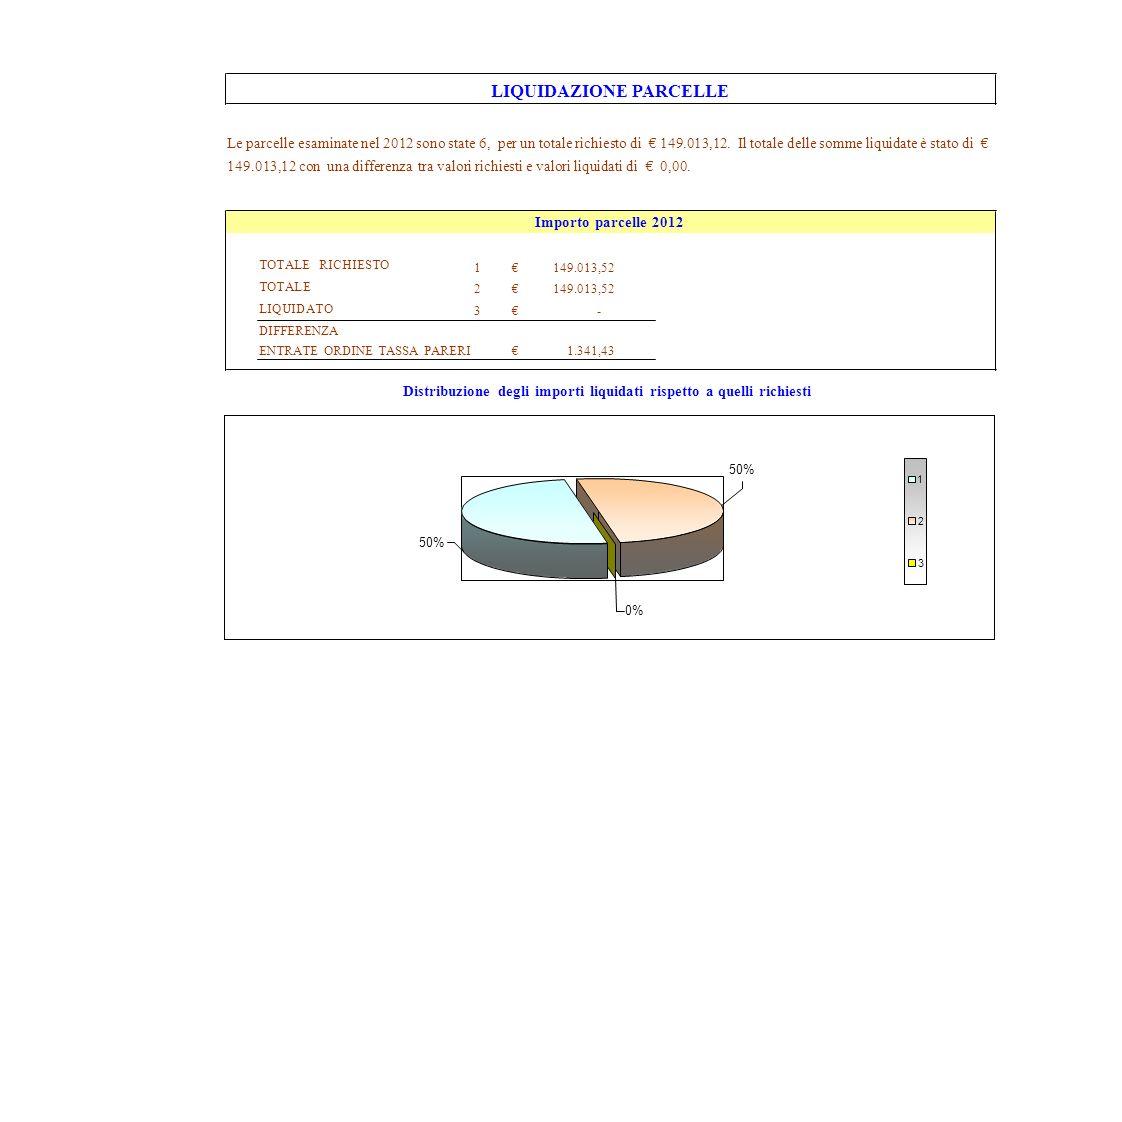 BAGNO DONNE N.1 CASSETTA PRONTO SOCCORSO N. 1 SCALDINO N.